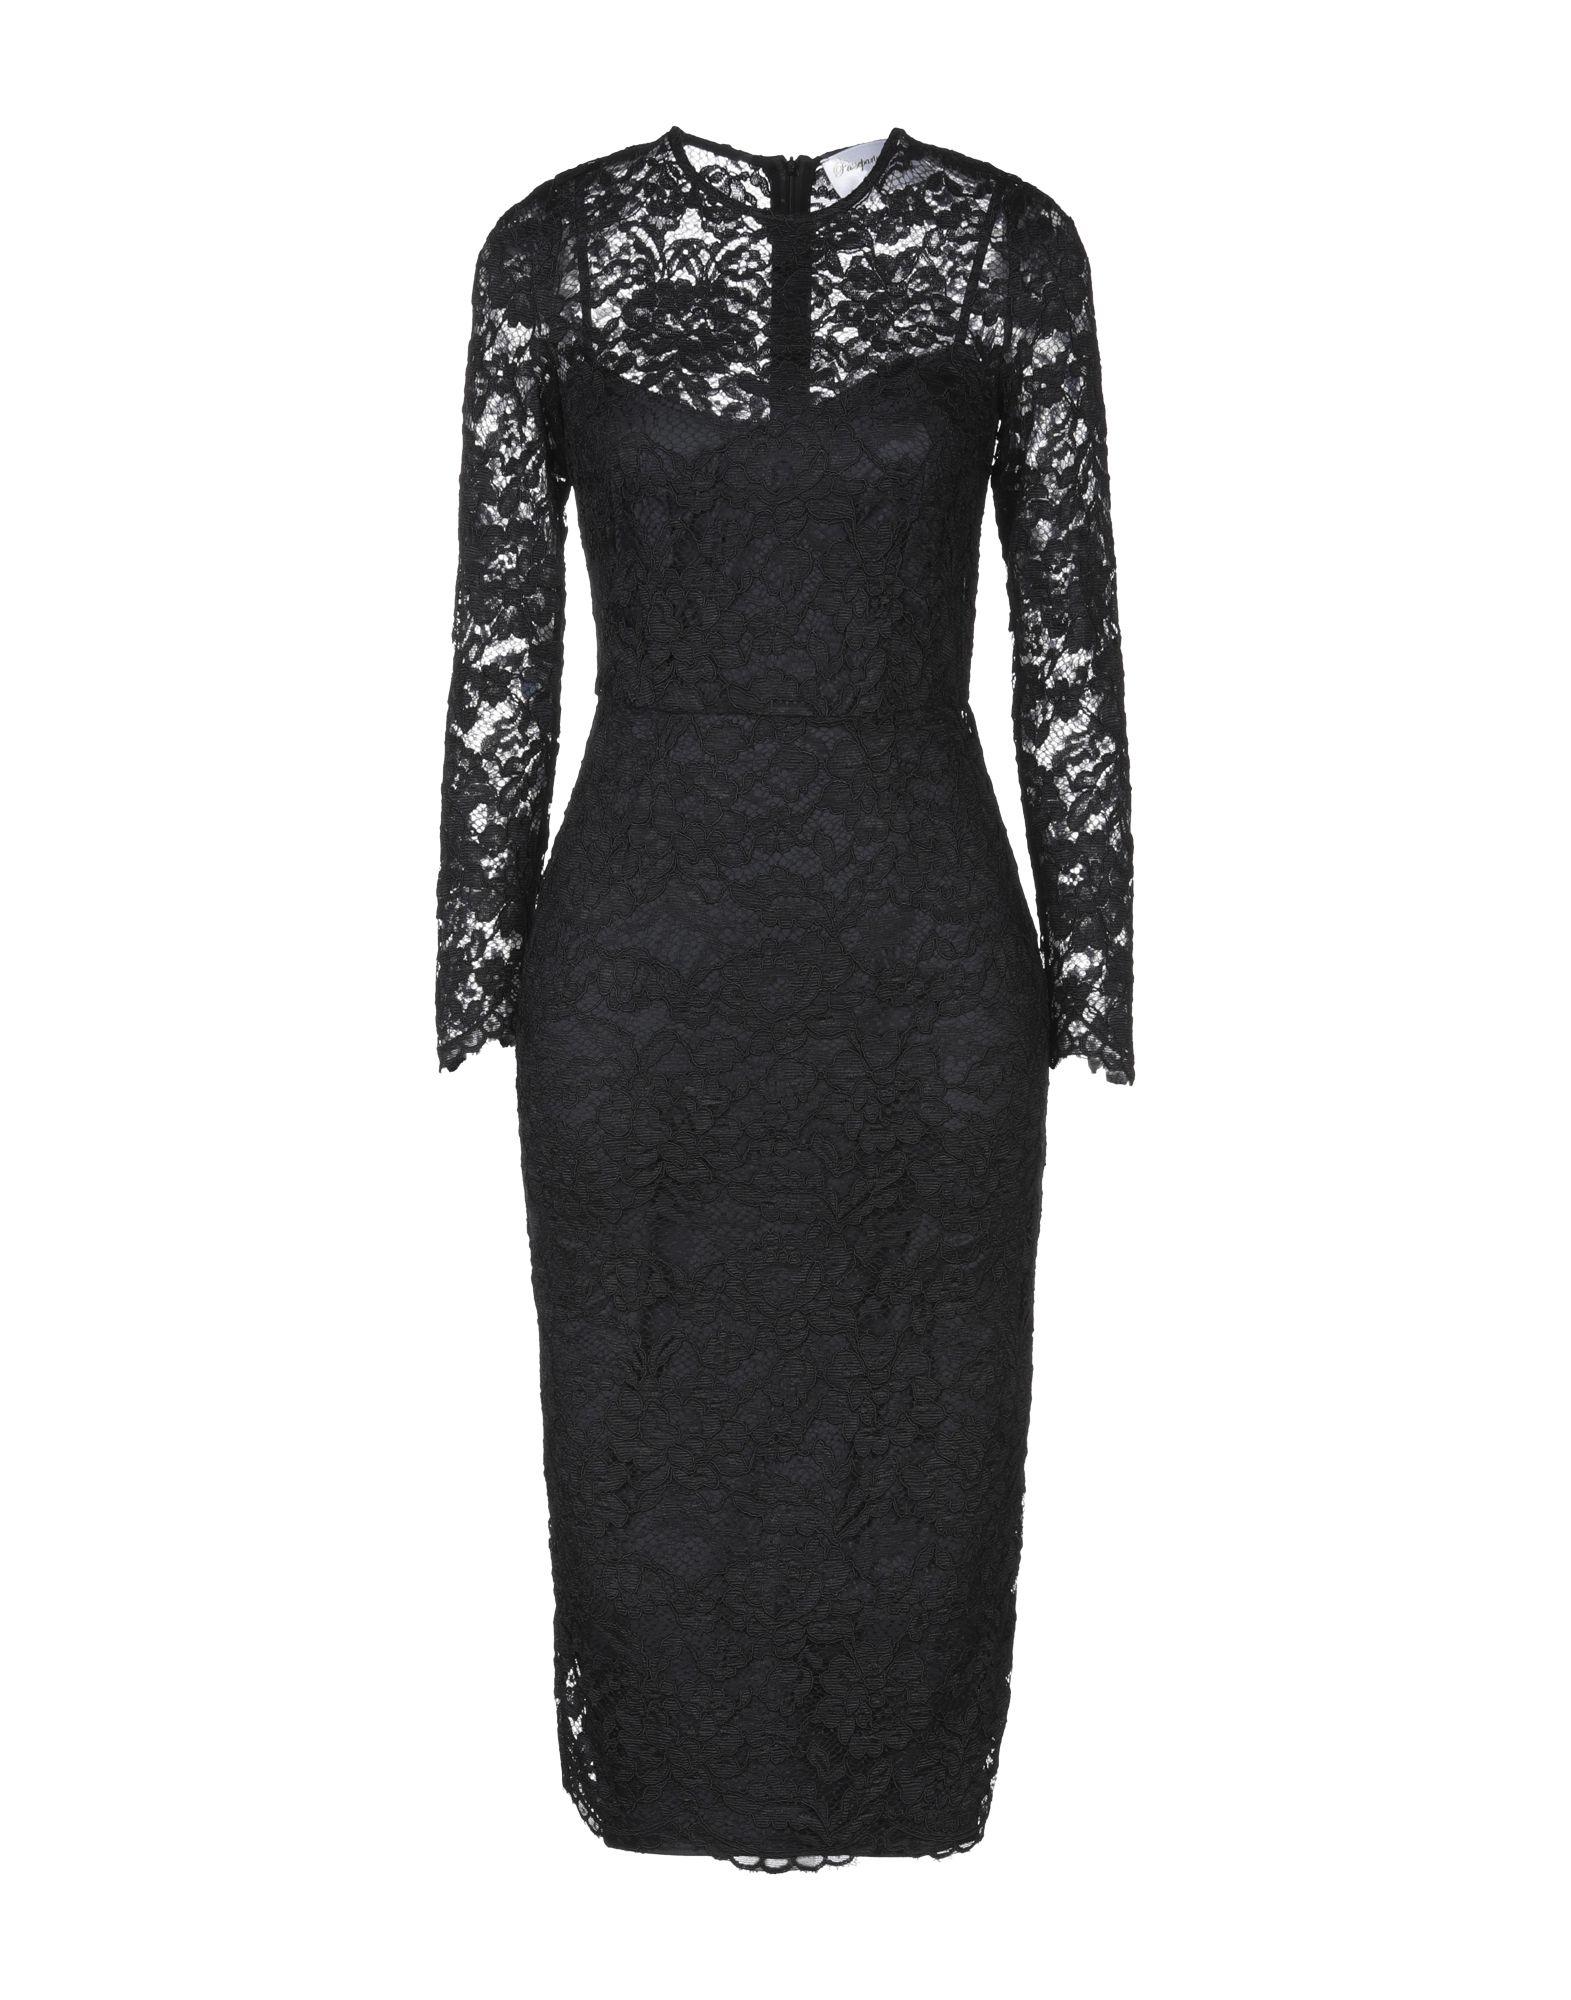 PASSEPARTOUT DRESS by ELISABETTA FRANCHI CELYN b. Платье длиной 3/4